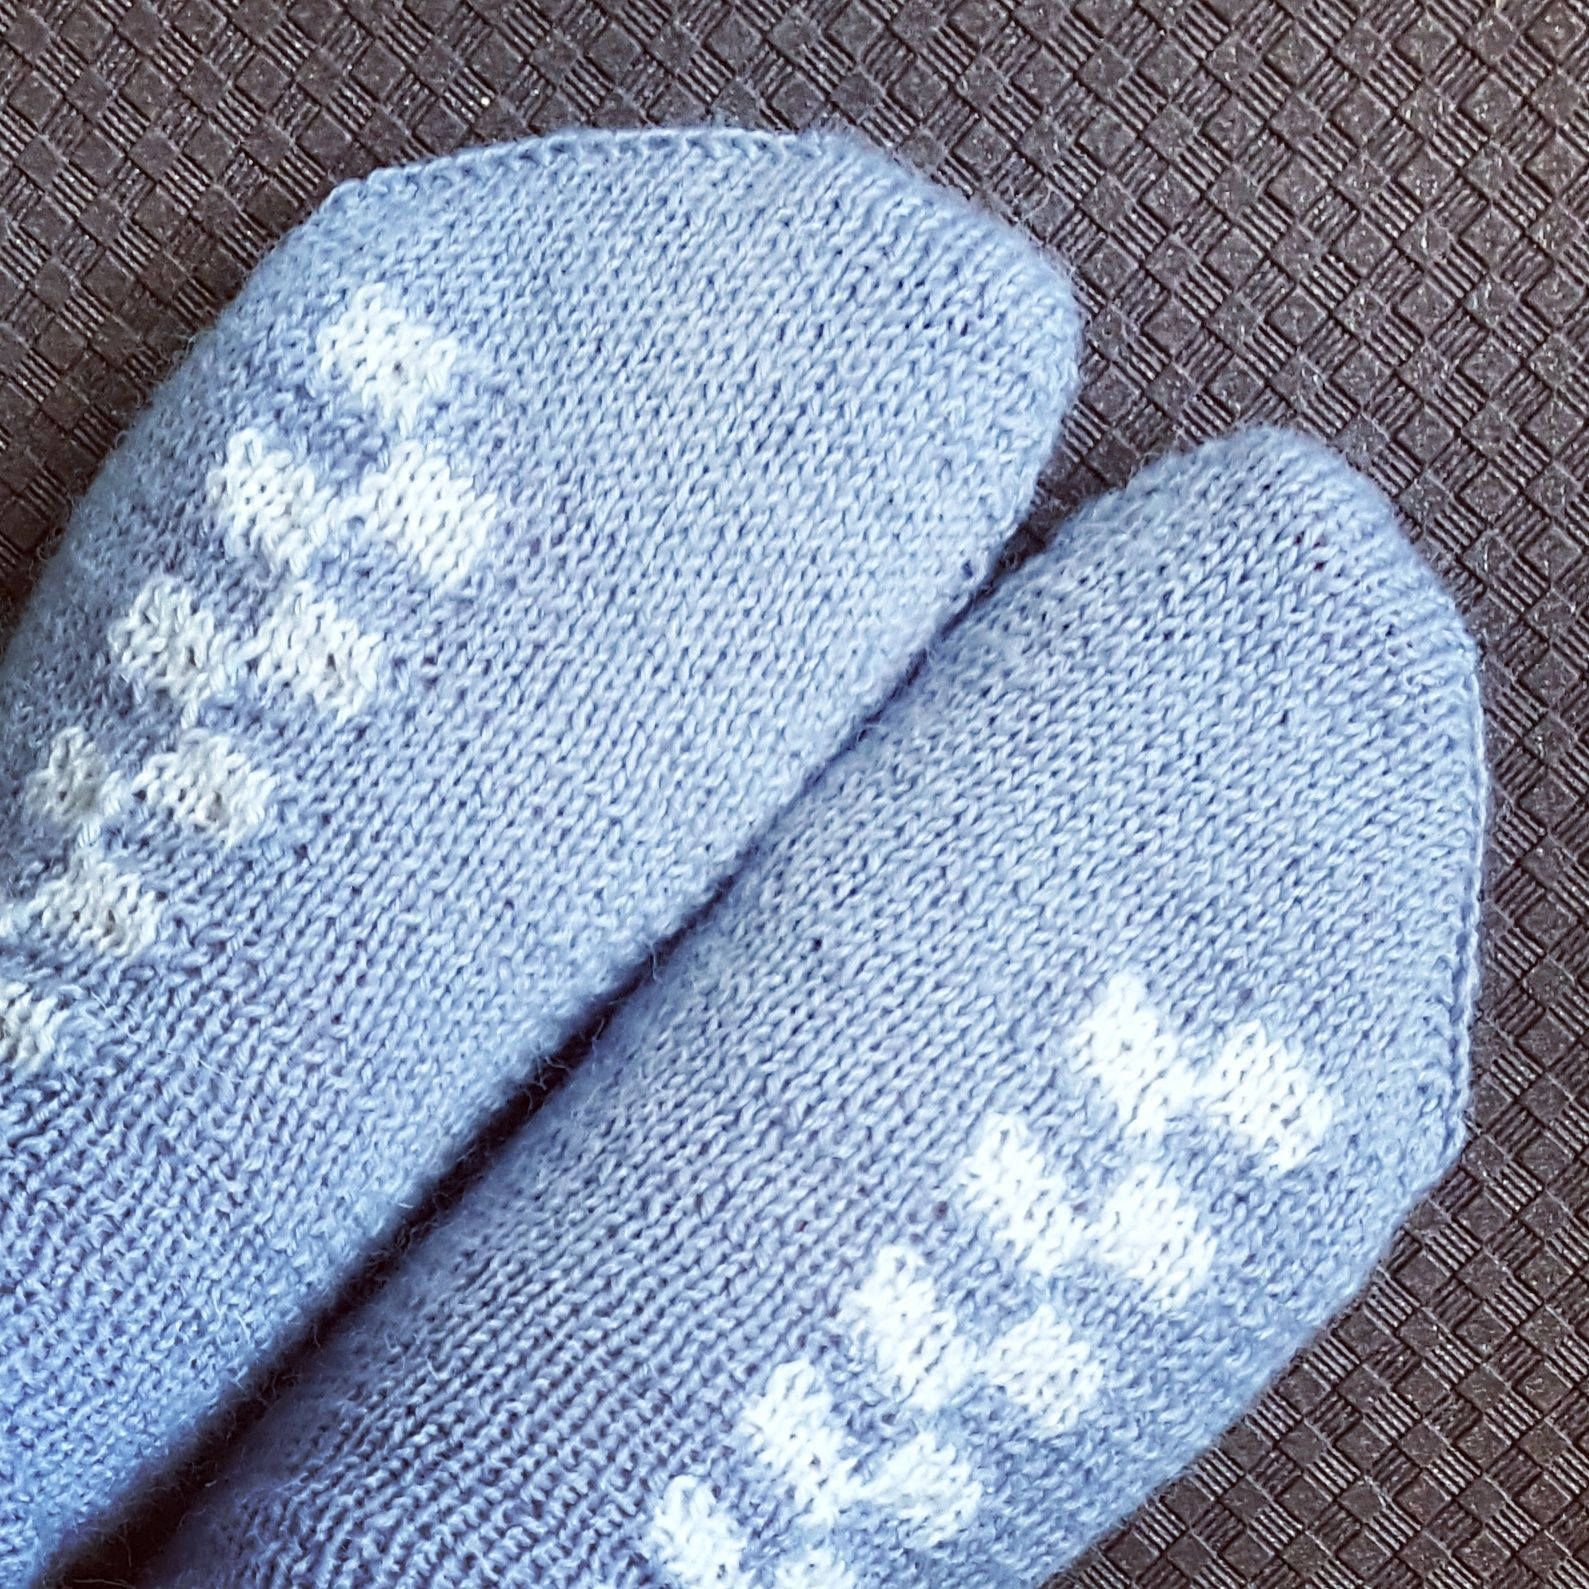 Battenberg socks - free knitting pattern by Knitting and so on ...